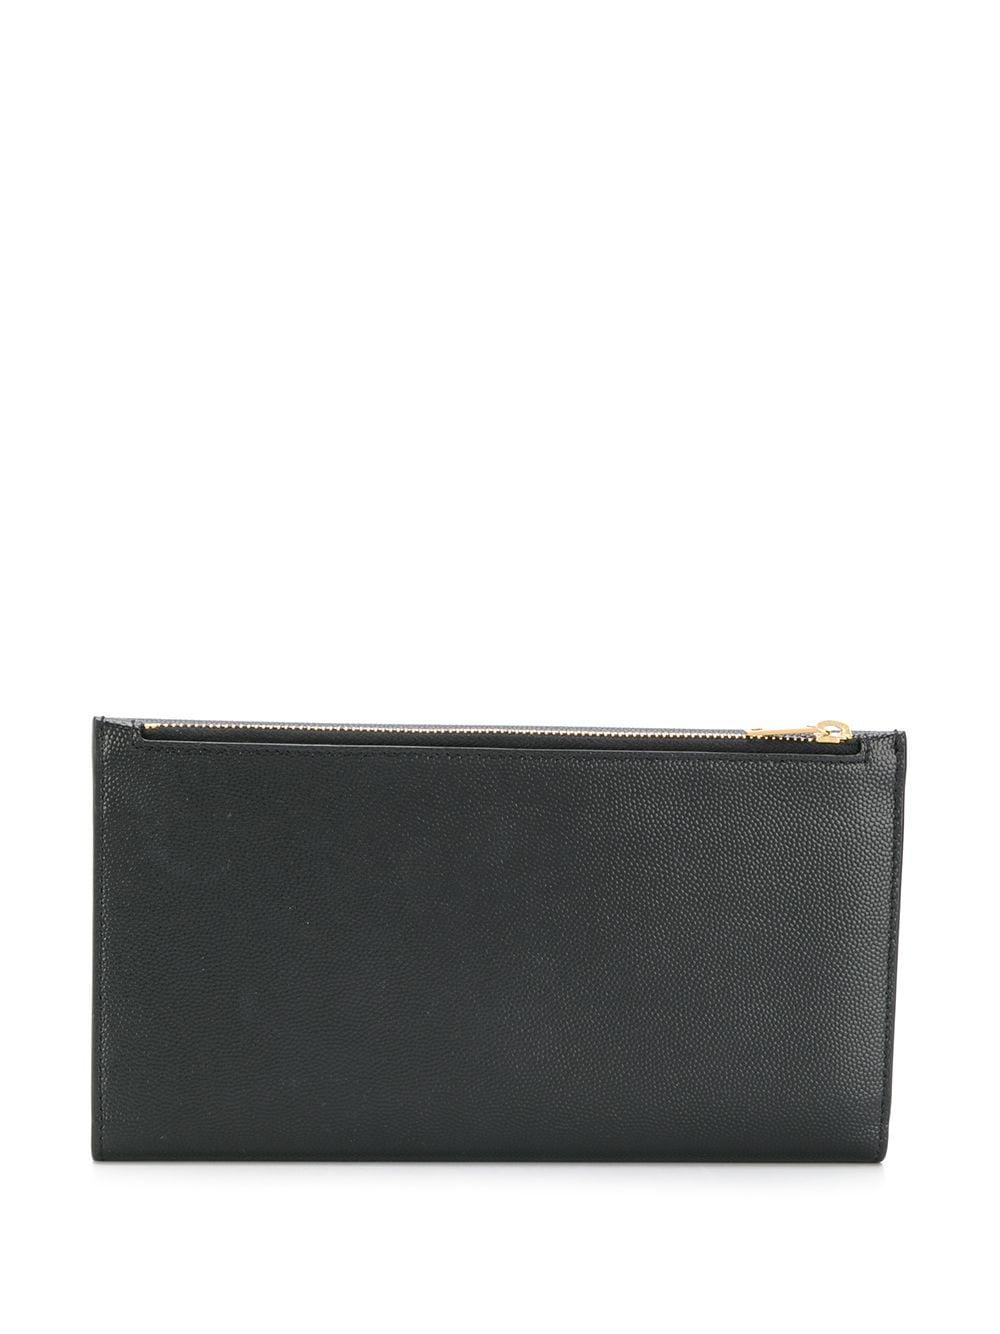 Picture of Saint Laurent   Uptown Large Wallet